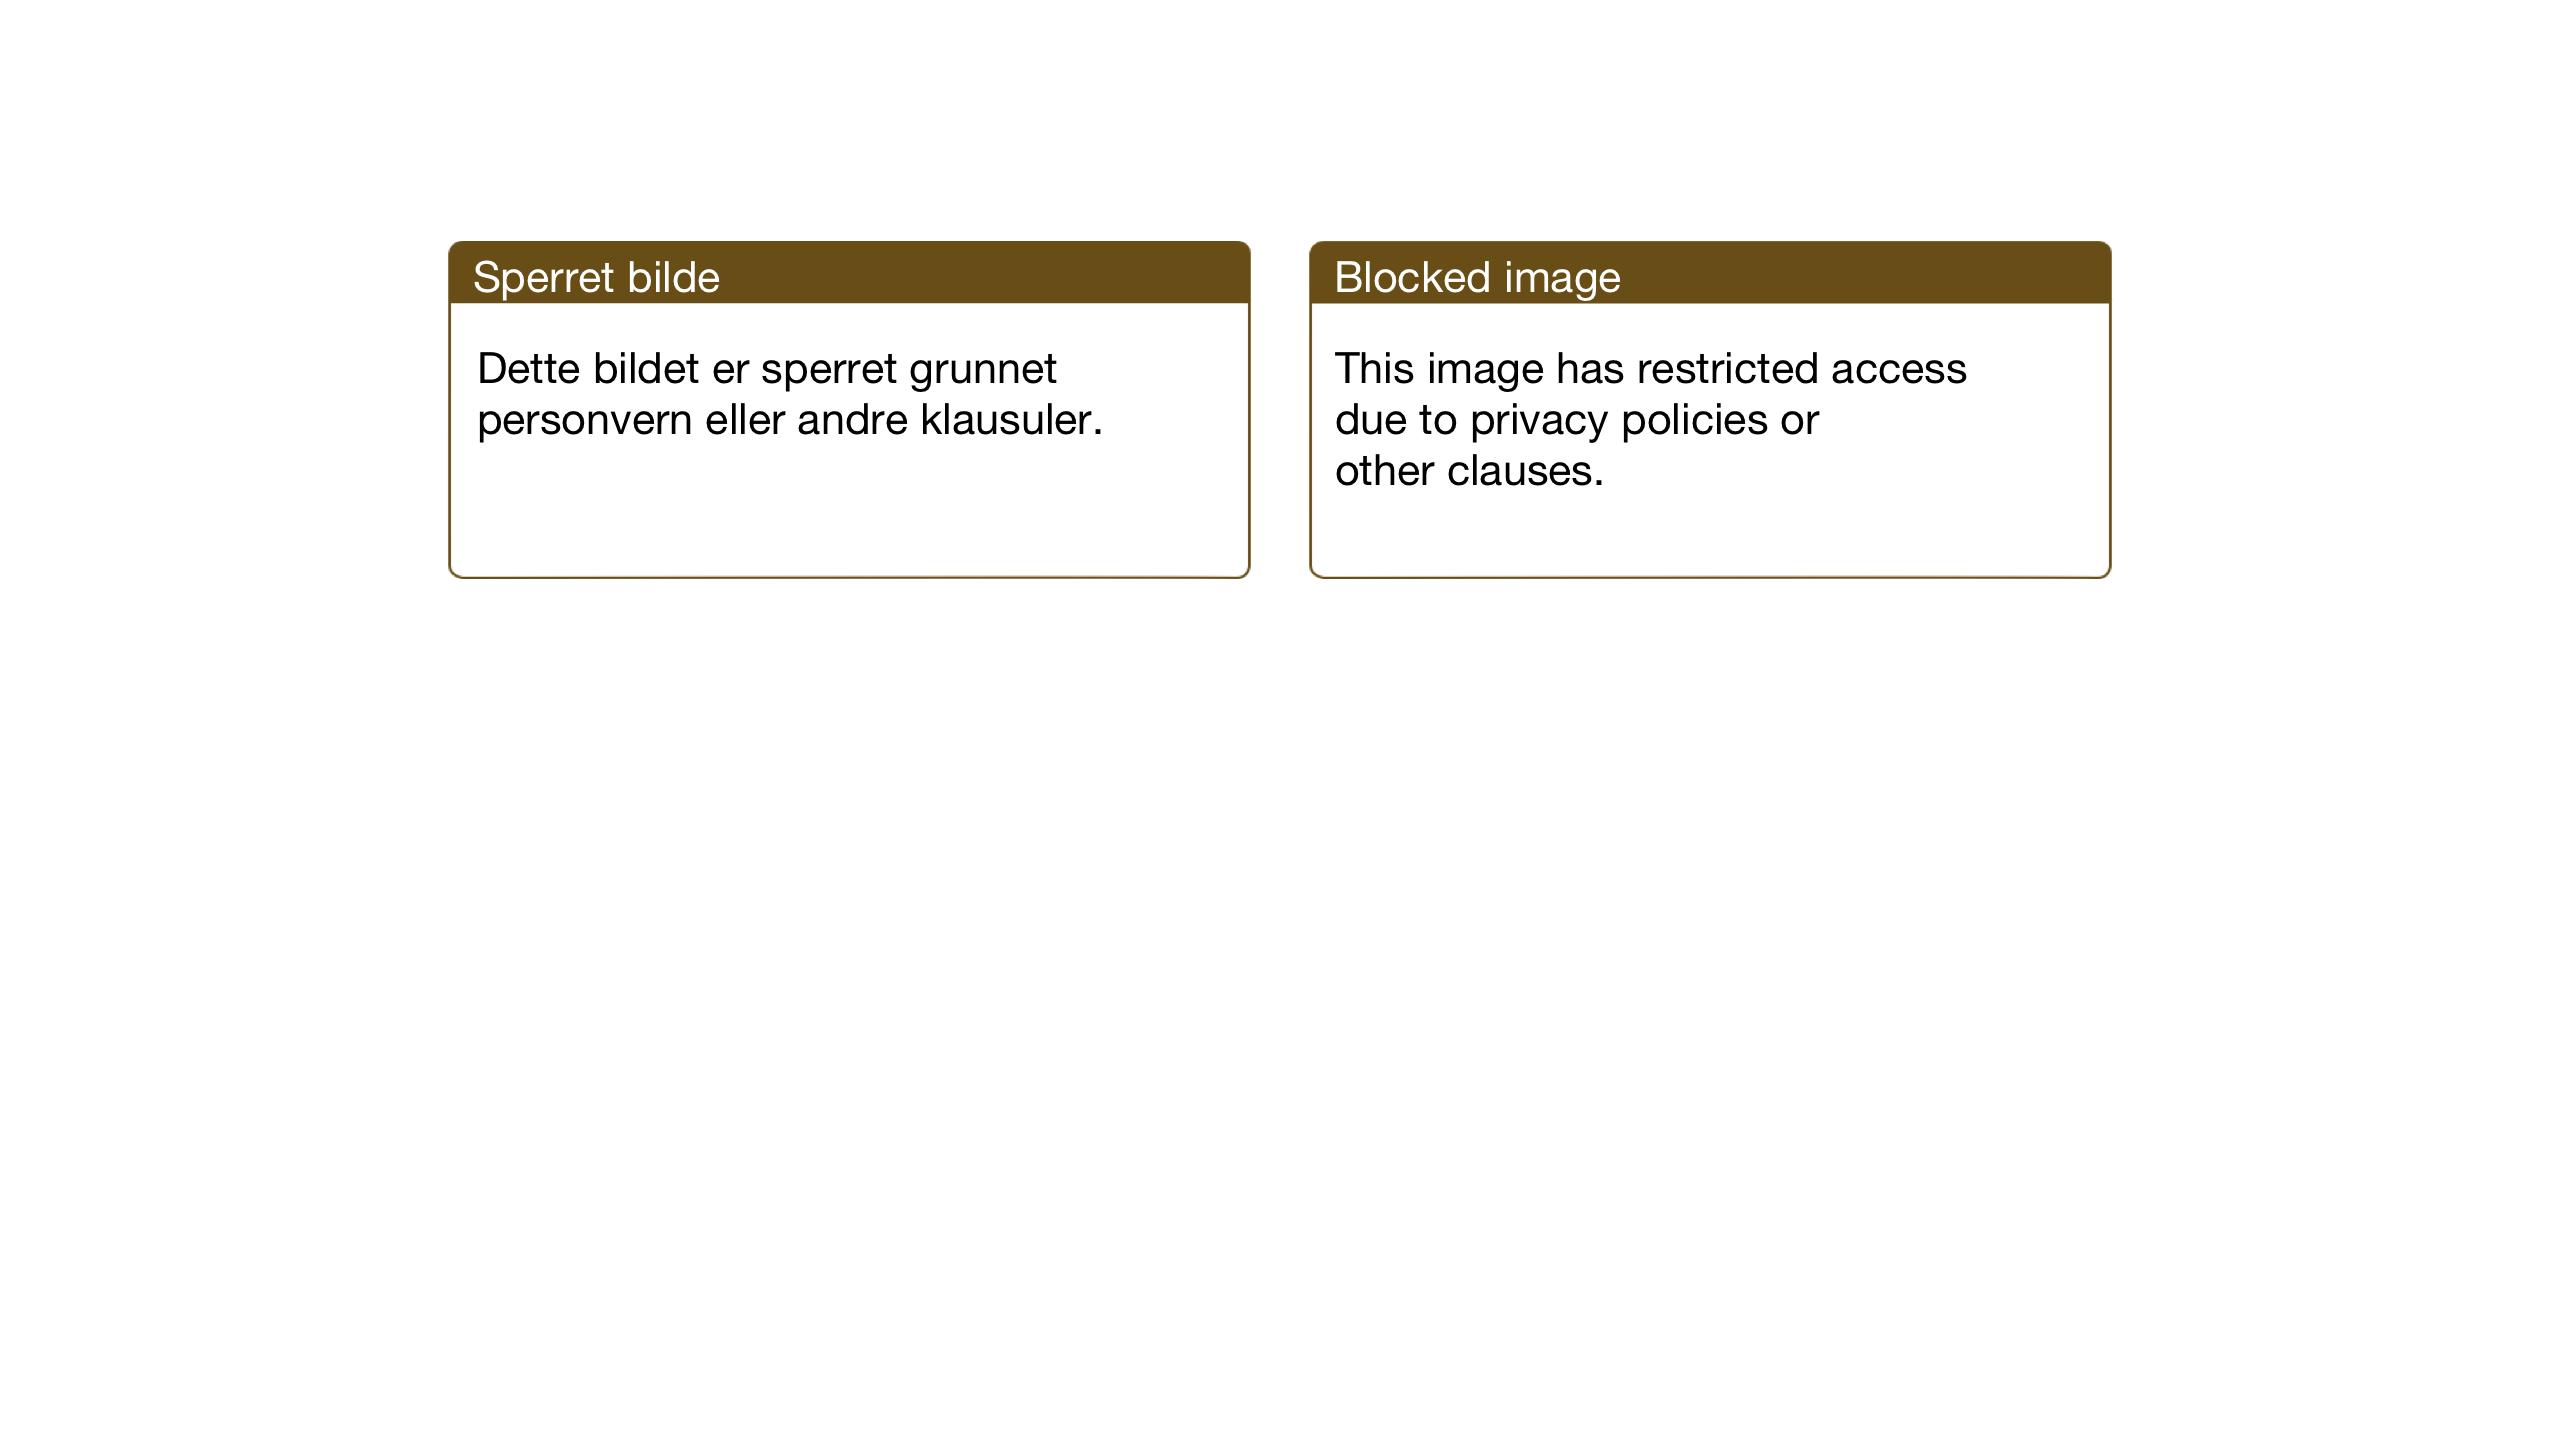 SAH, Vardal prestekontor, H/Ha/Haa/L0018: Ministerialbok nr. 18, 1930-1945, s. 9